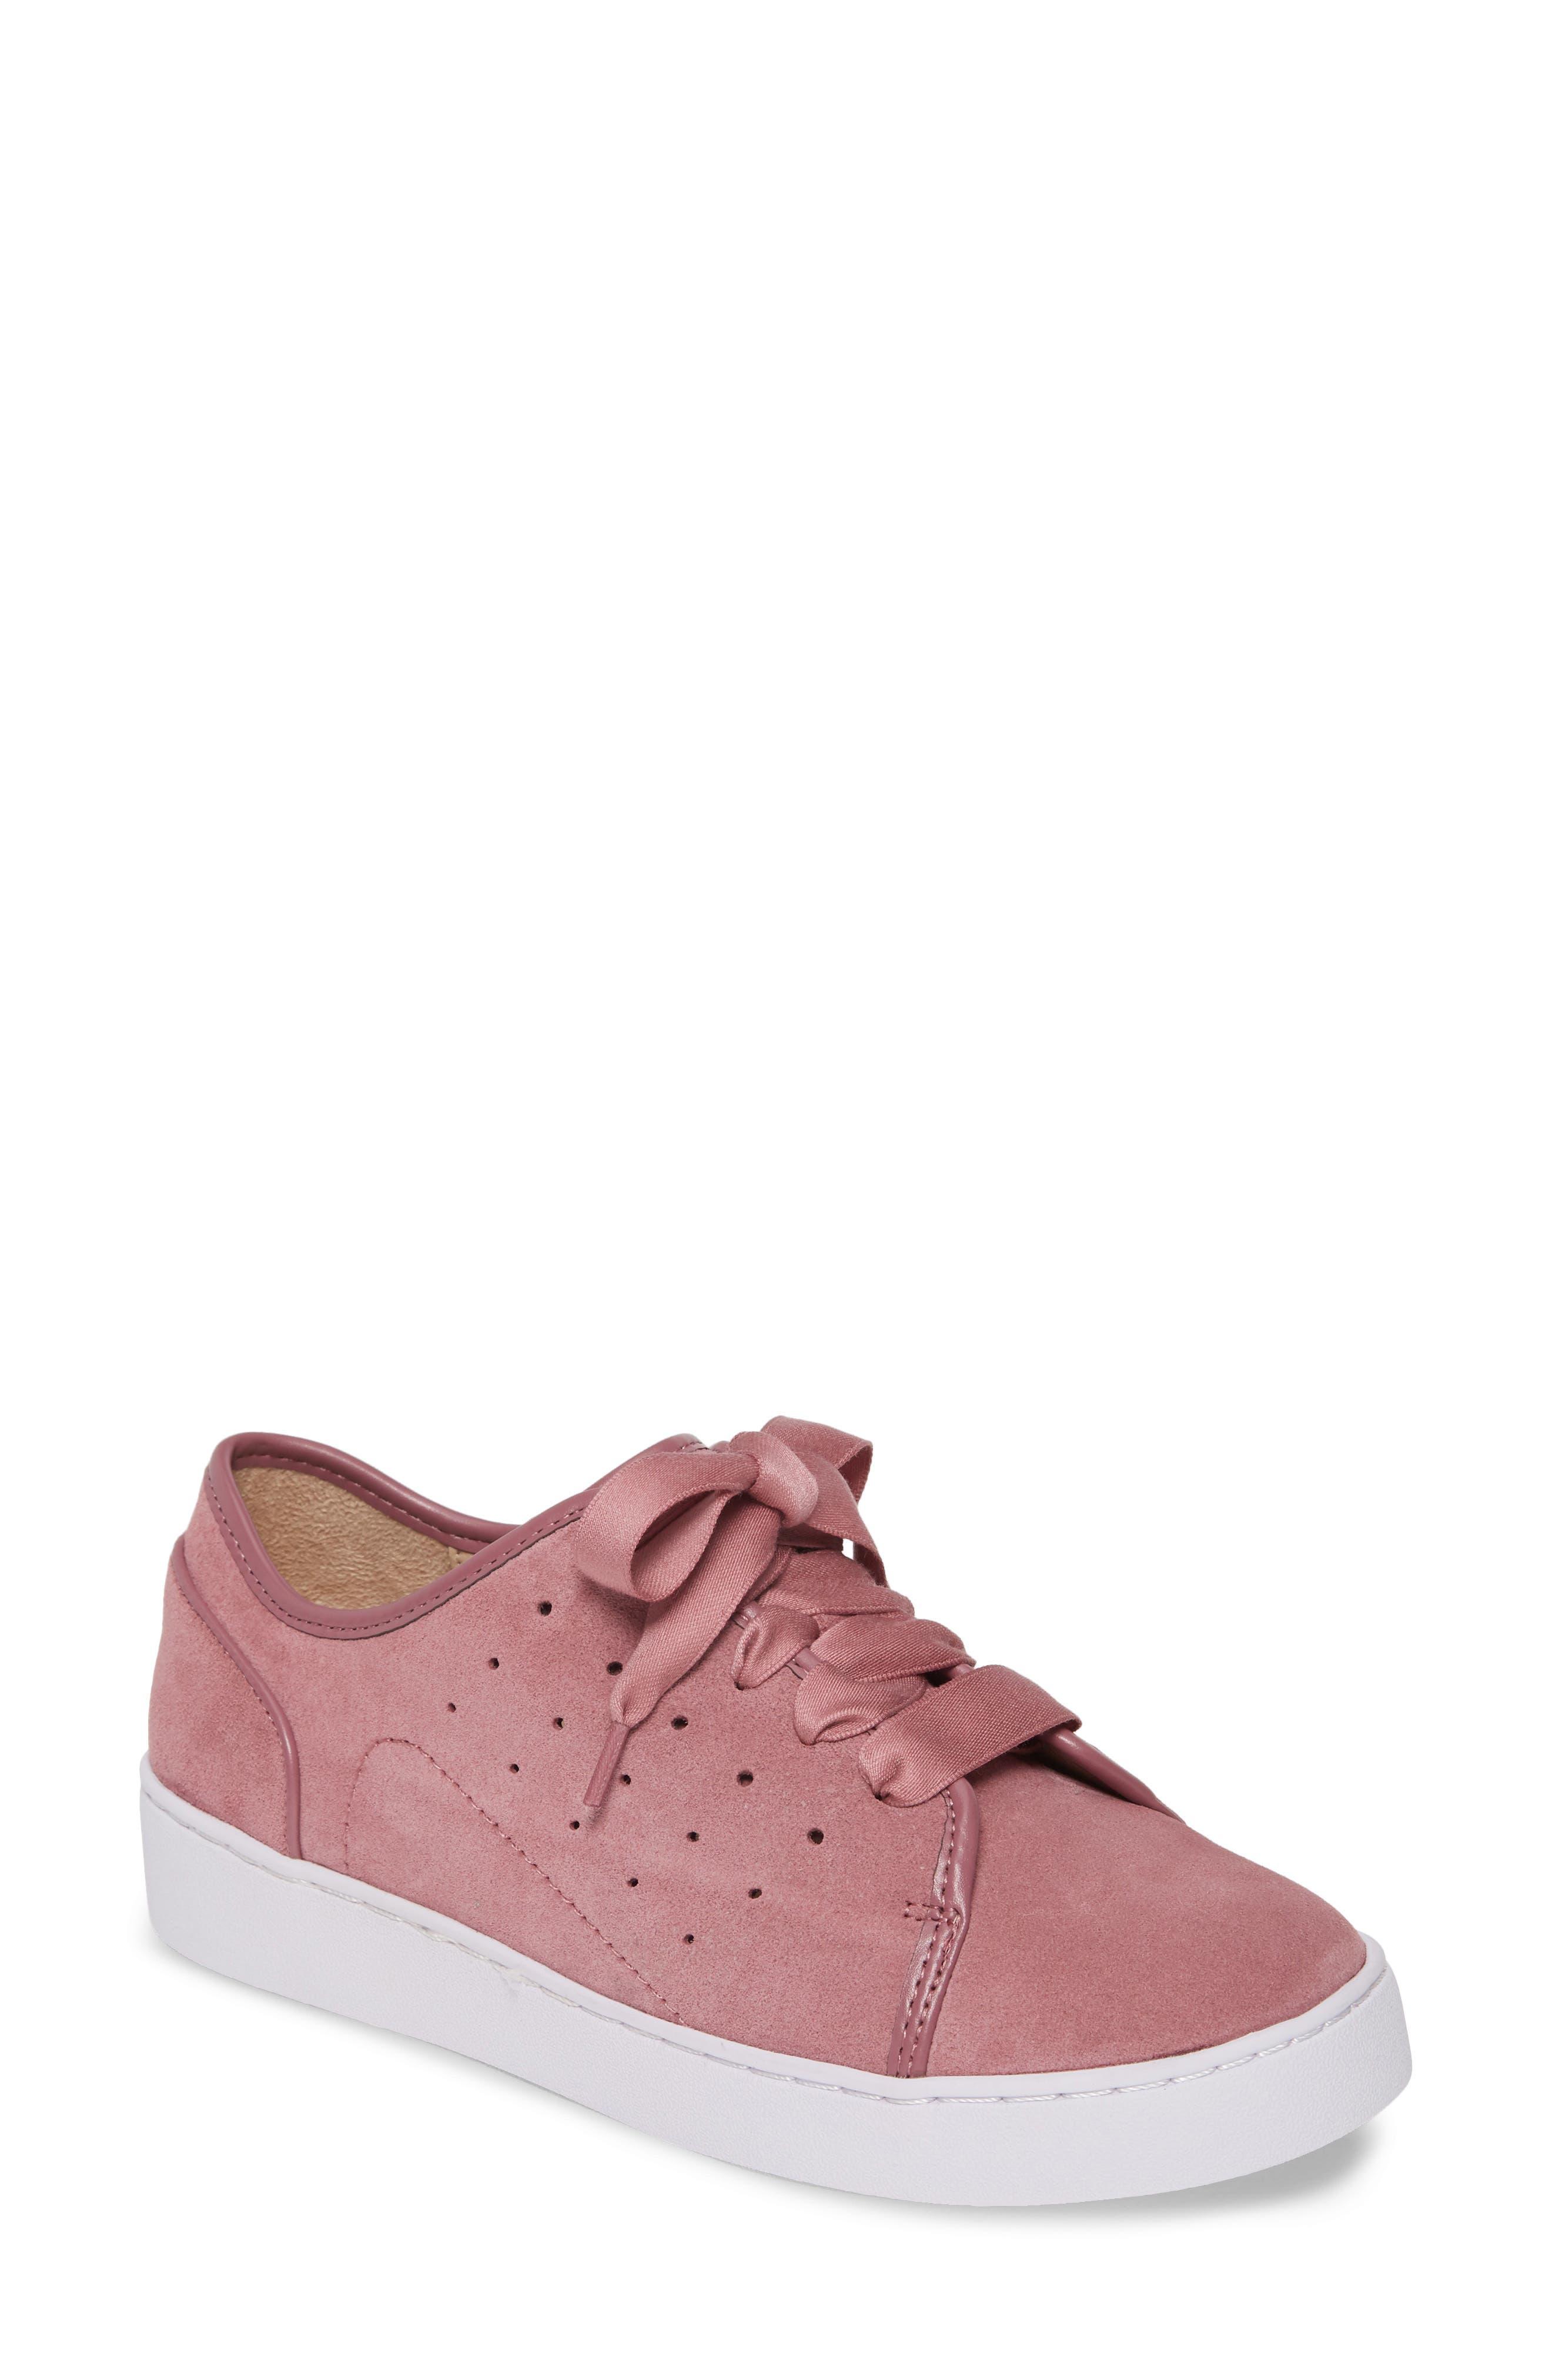 Vionic Keke Sneaker, Pink